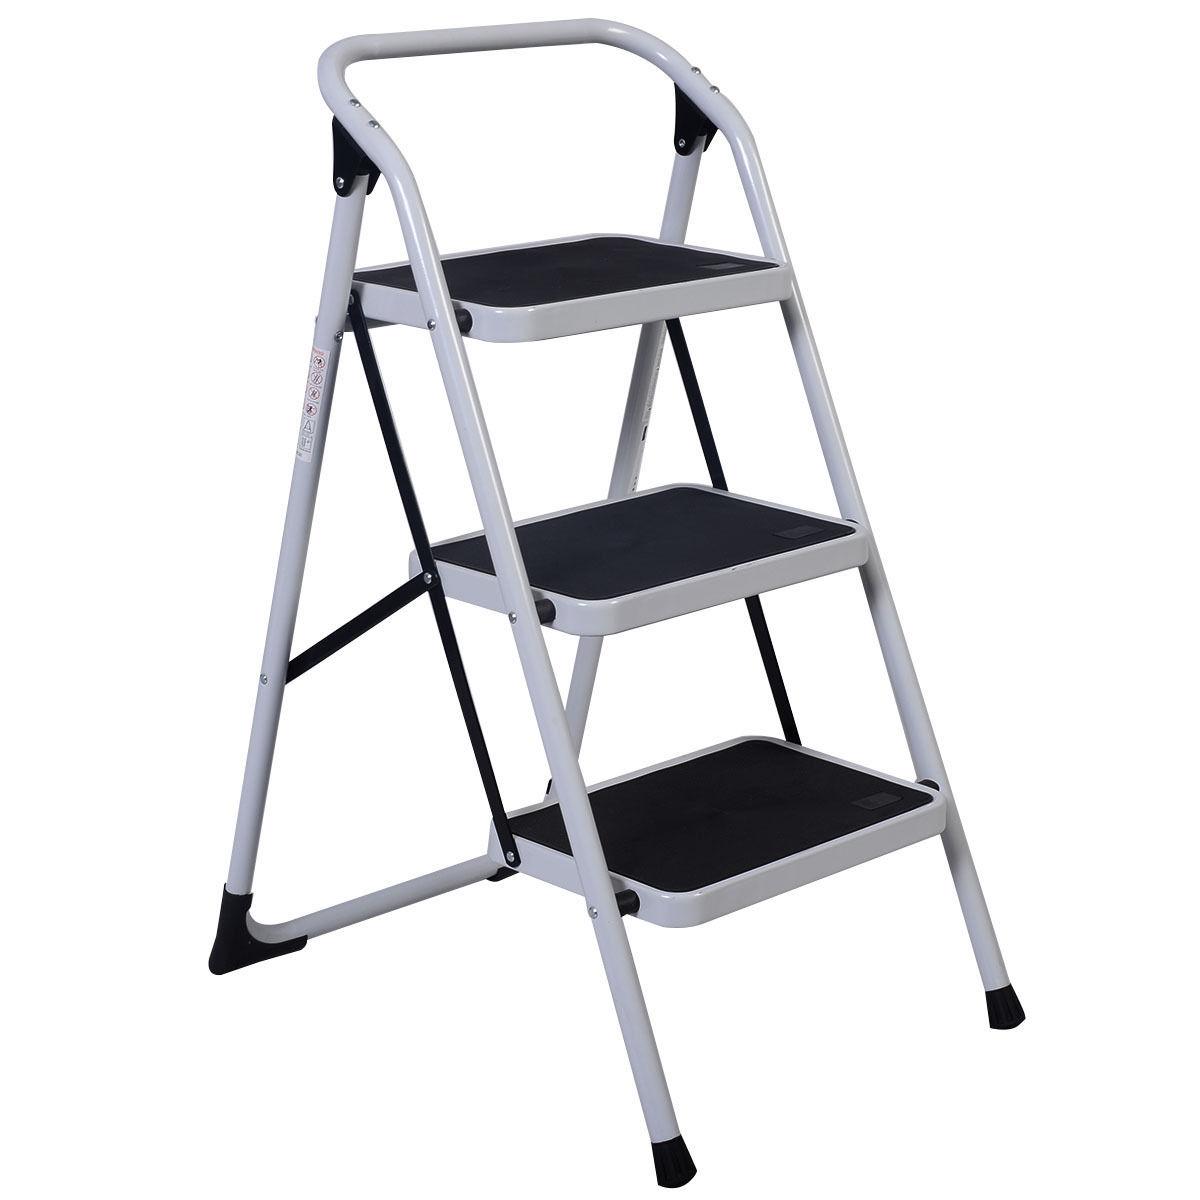 10 5 16 5ft Simple Aluminium Foldable Extension Ladder